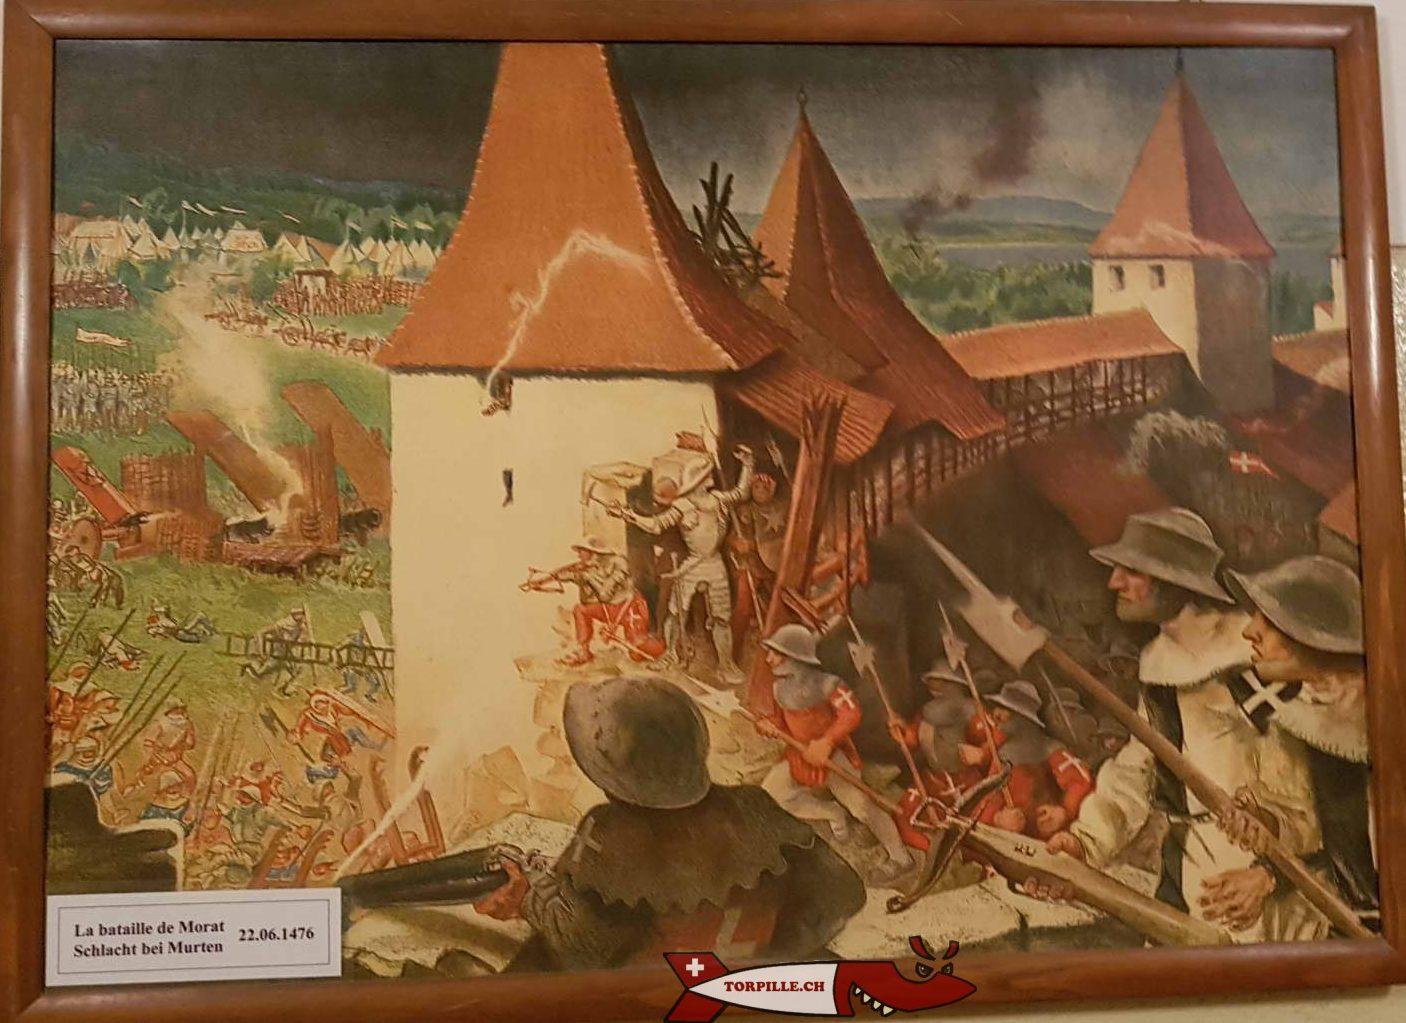 Tableau de la bataille de morat au Fort Cindey - château de Suisse Romande